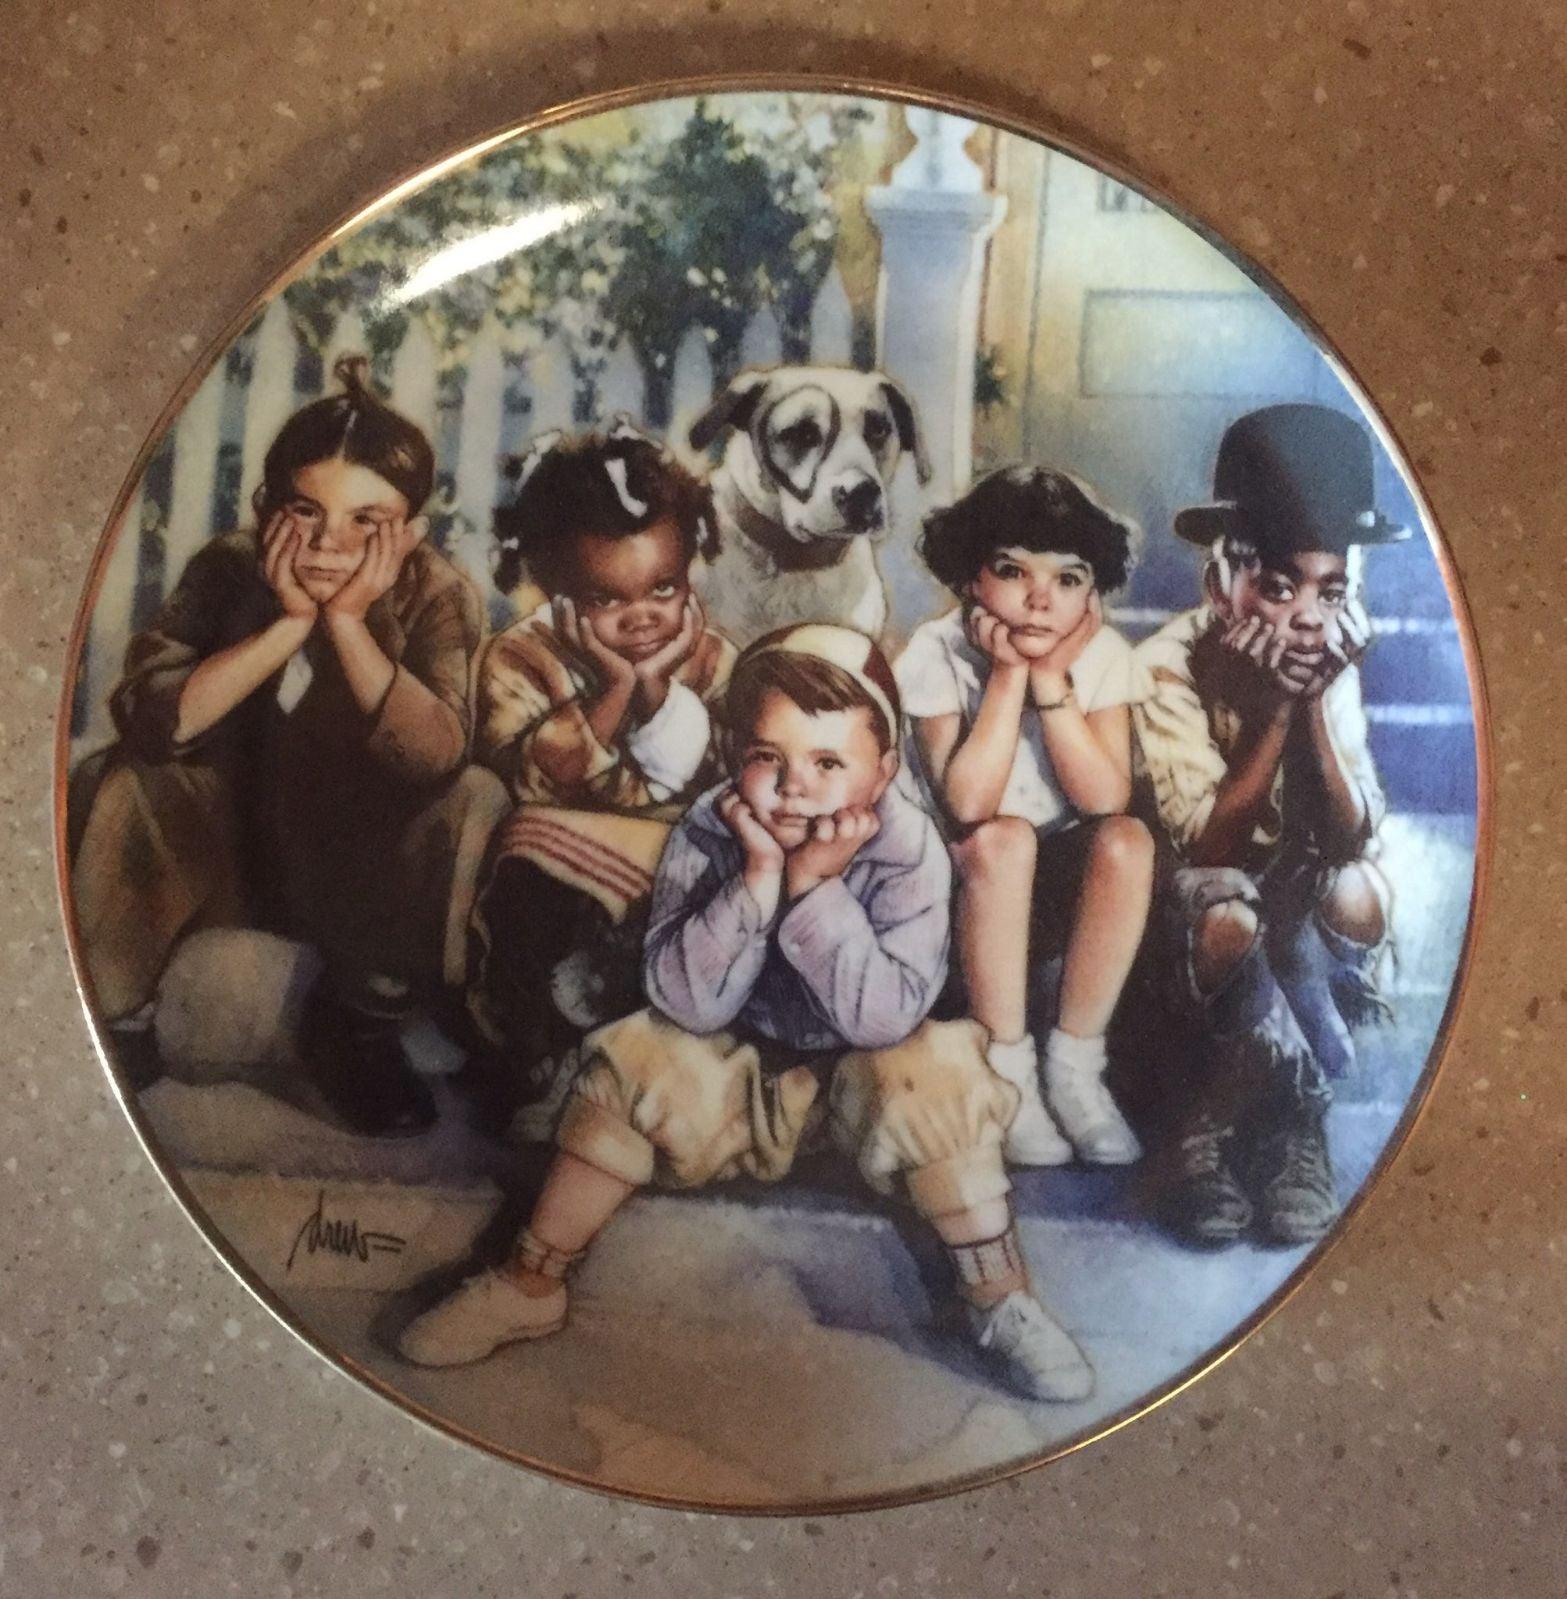 The Little Rascals Porcelain Plate